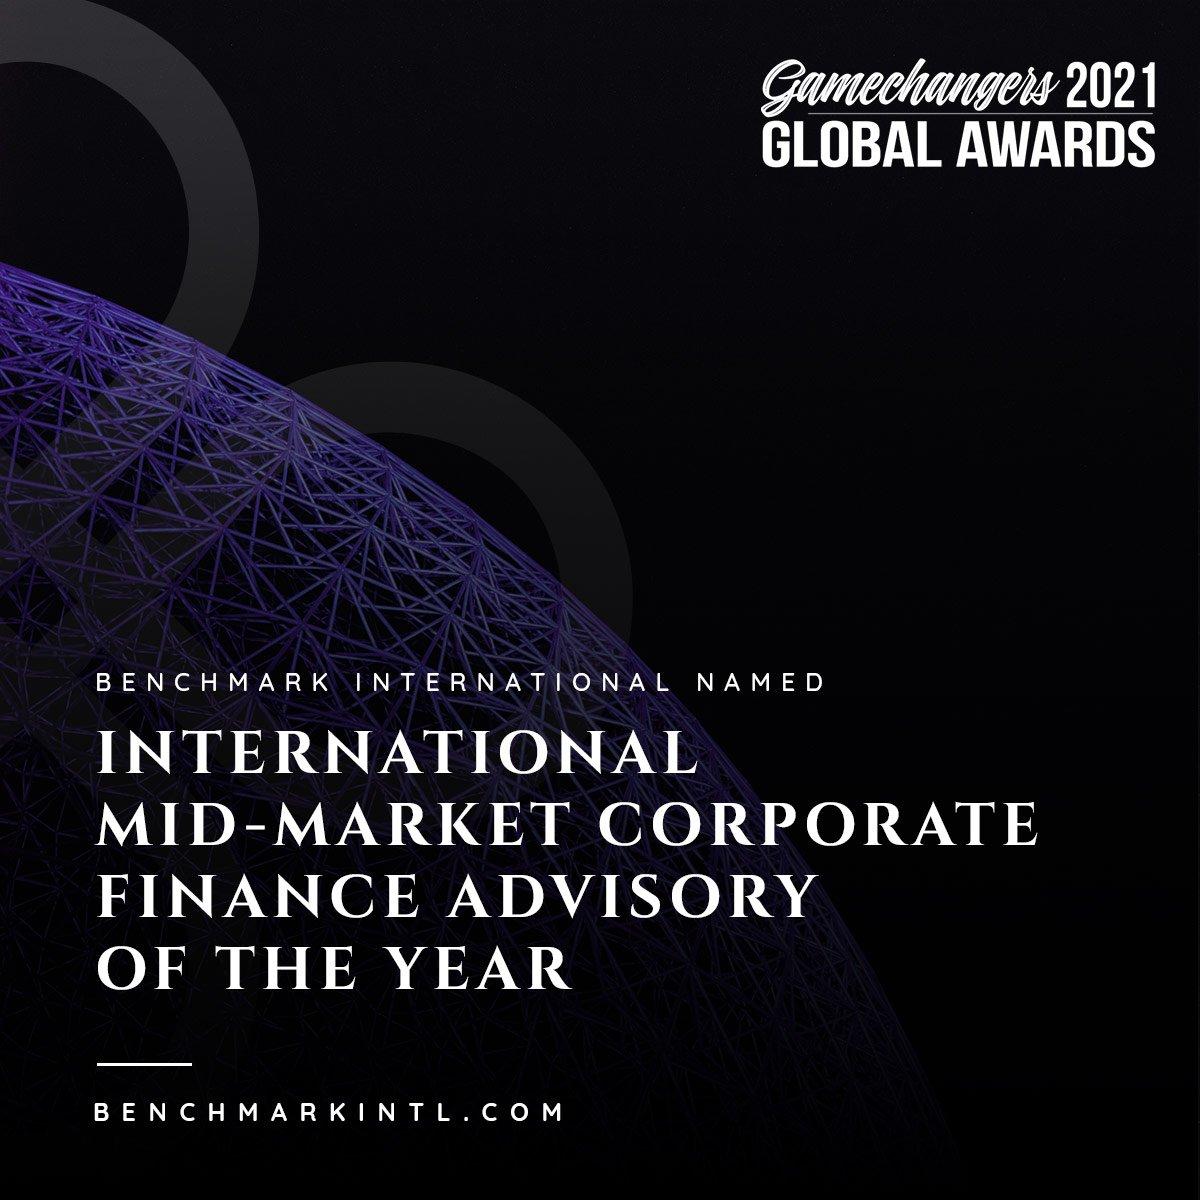 Benchmark_International_Named_International_Mid-Market_Corporate_Finance_Advisory_Of_The_Year_Social-1